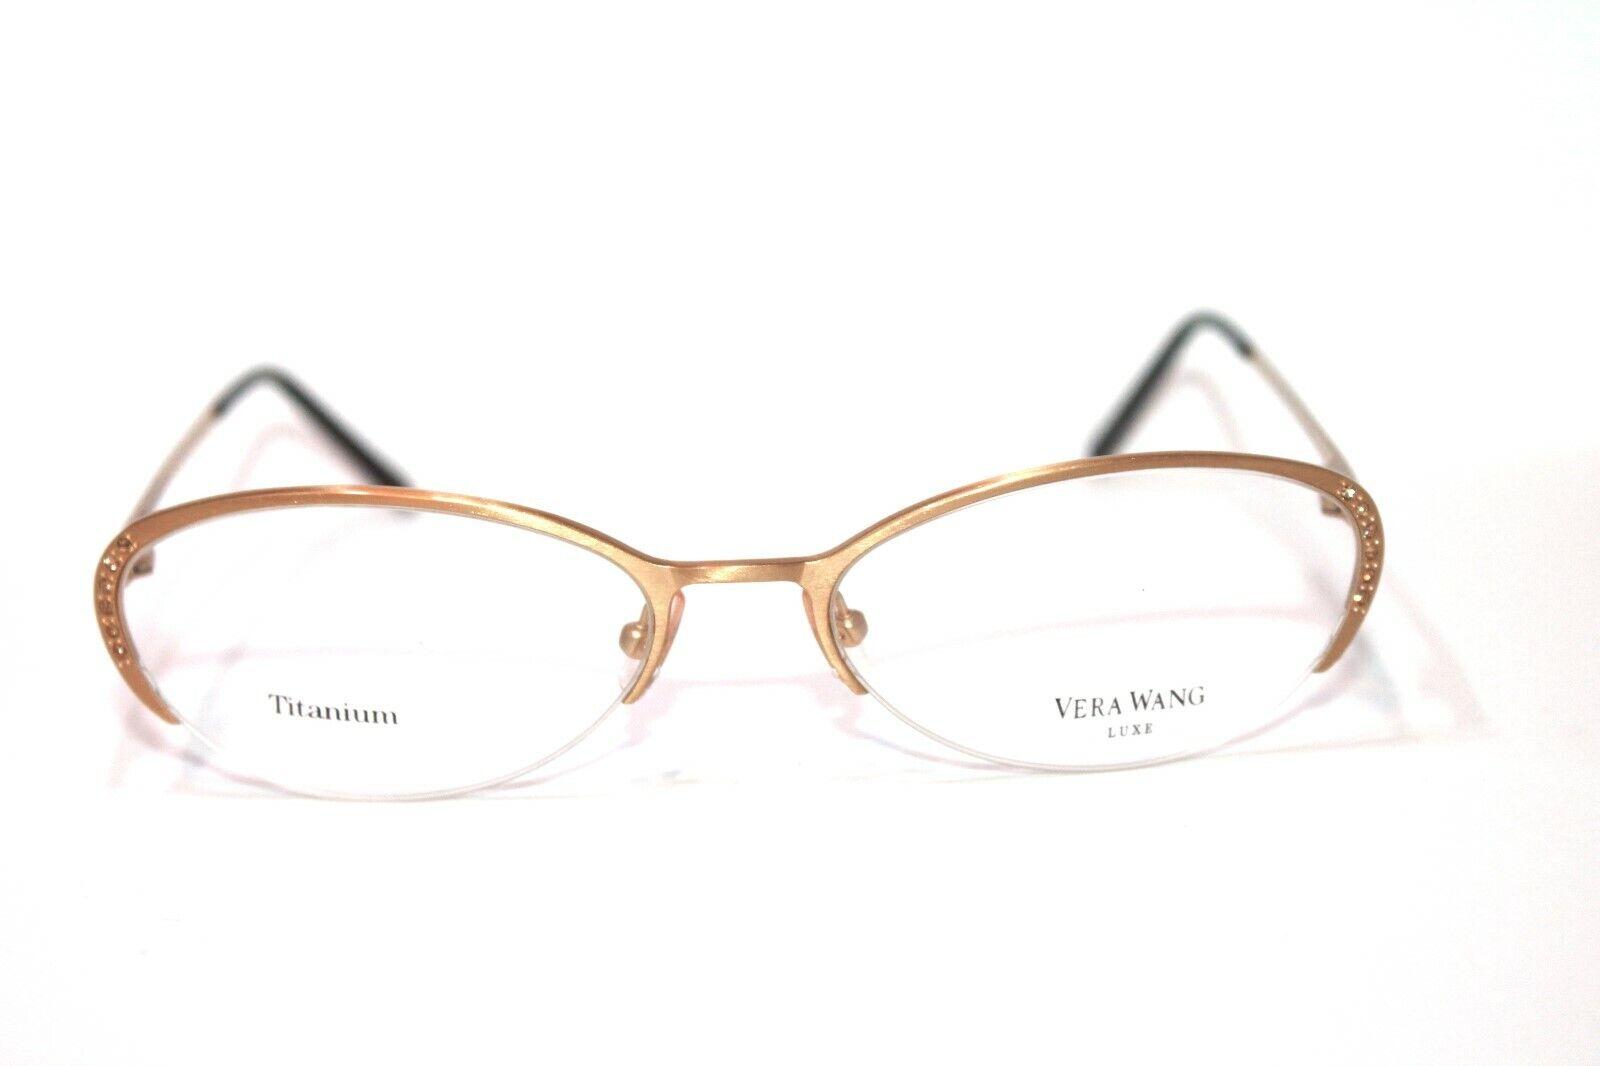 8 Vera Wang Eyeglass frames Semi-rimless Titanium Black, Gol